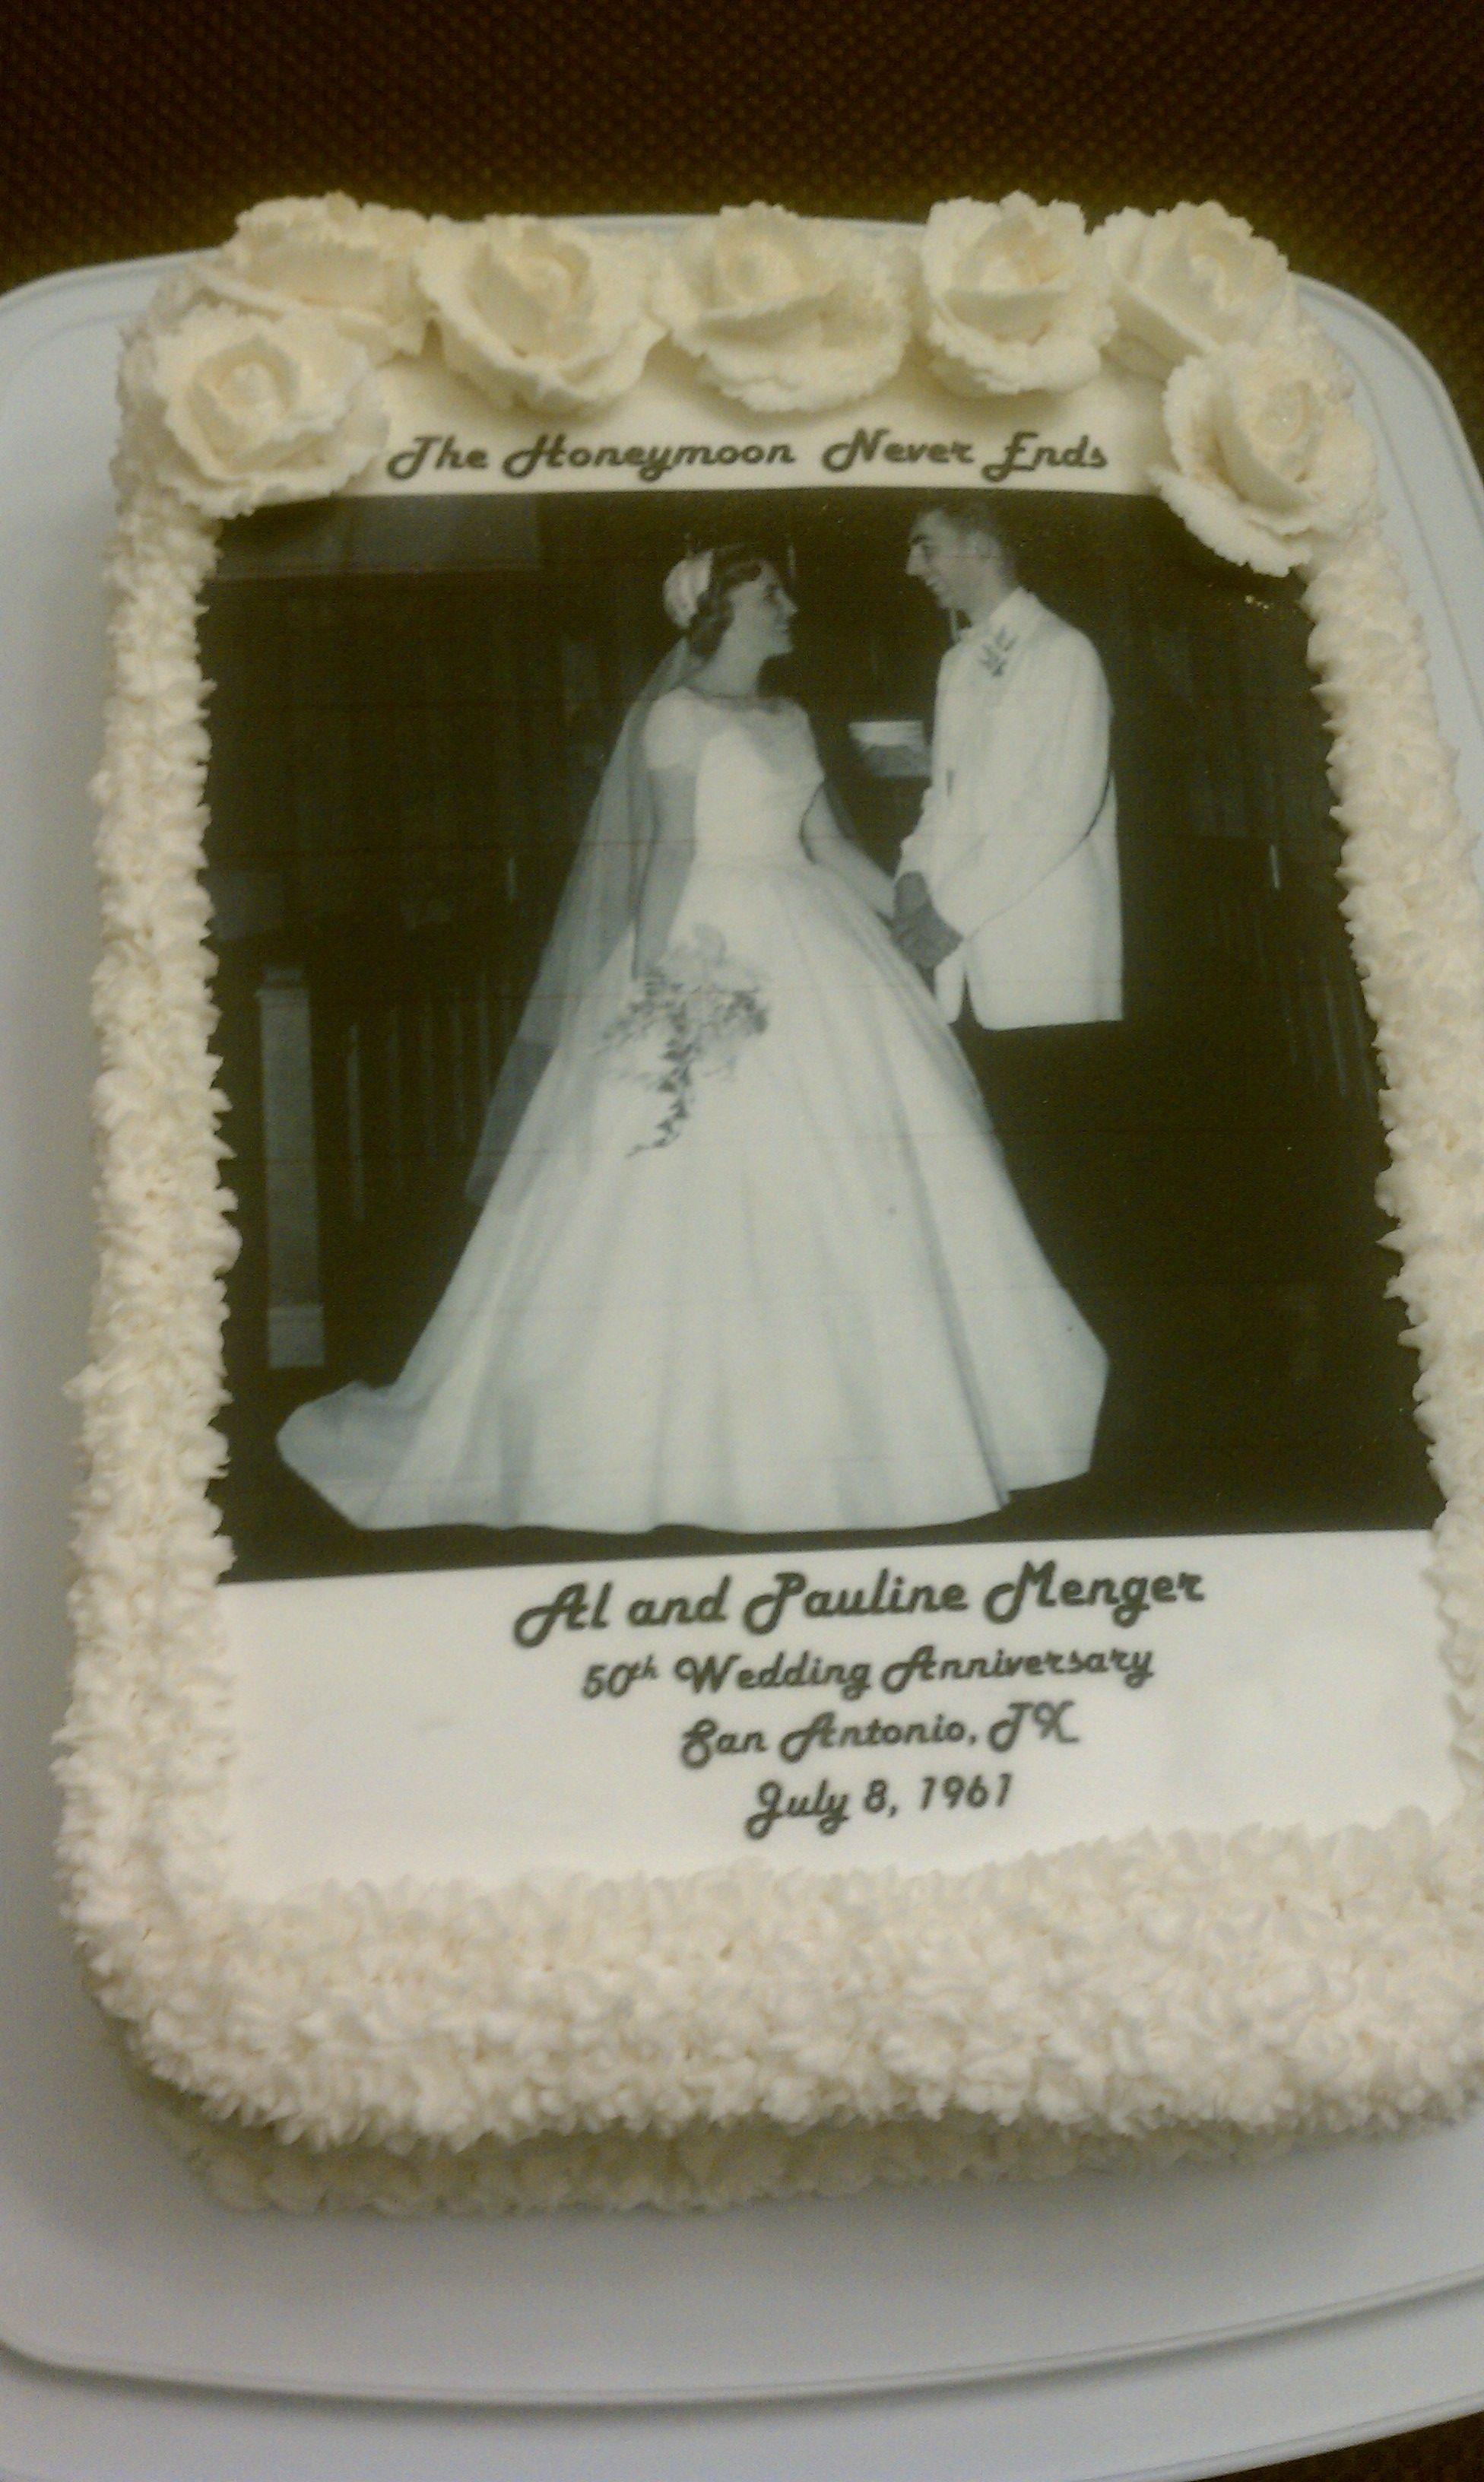 50th wedding decorations ideas  Anniversary Cake w Mom and Dadus wedding photo on it  Yummy